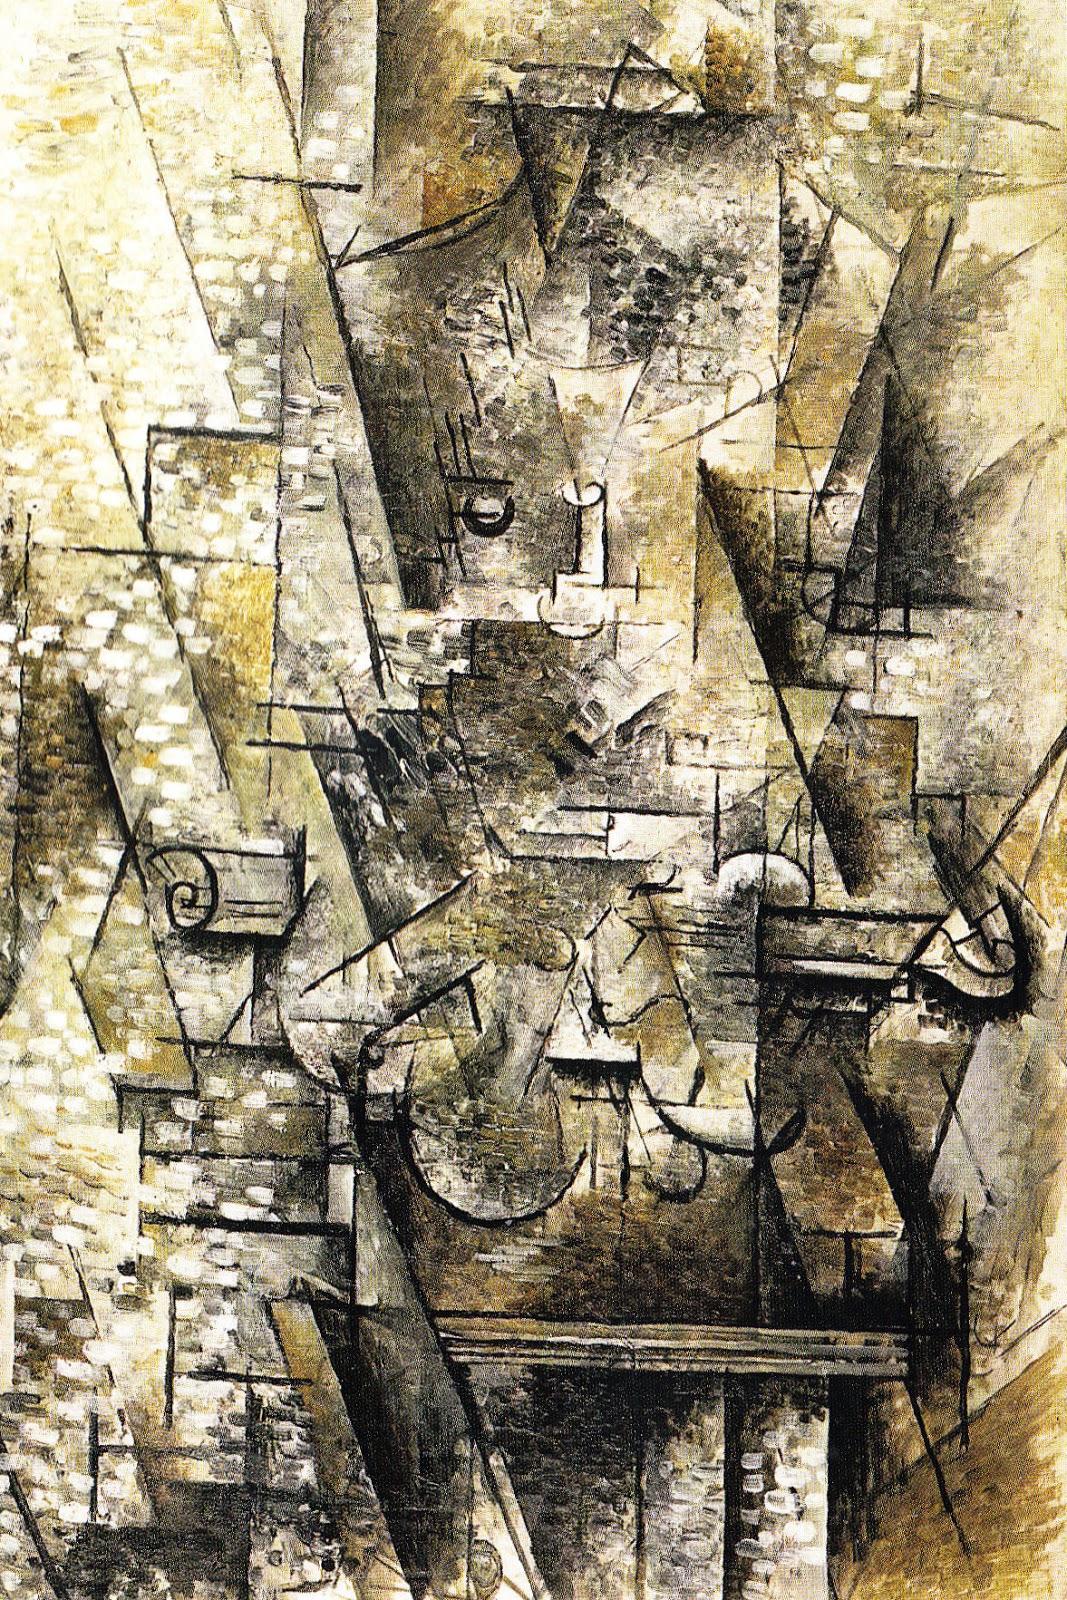 Decouverte mouvement futuriste for Braque peintre